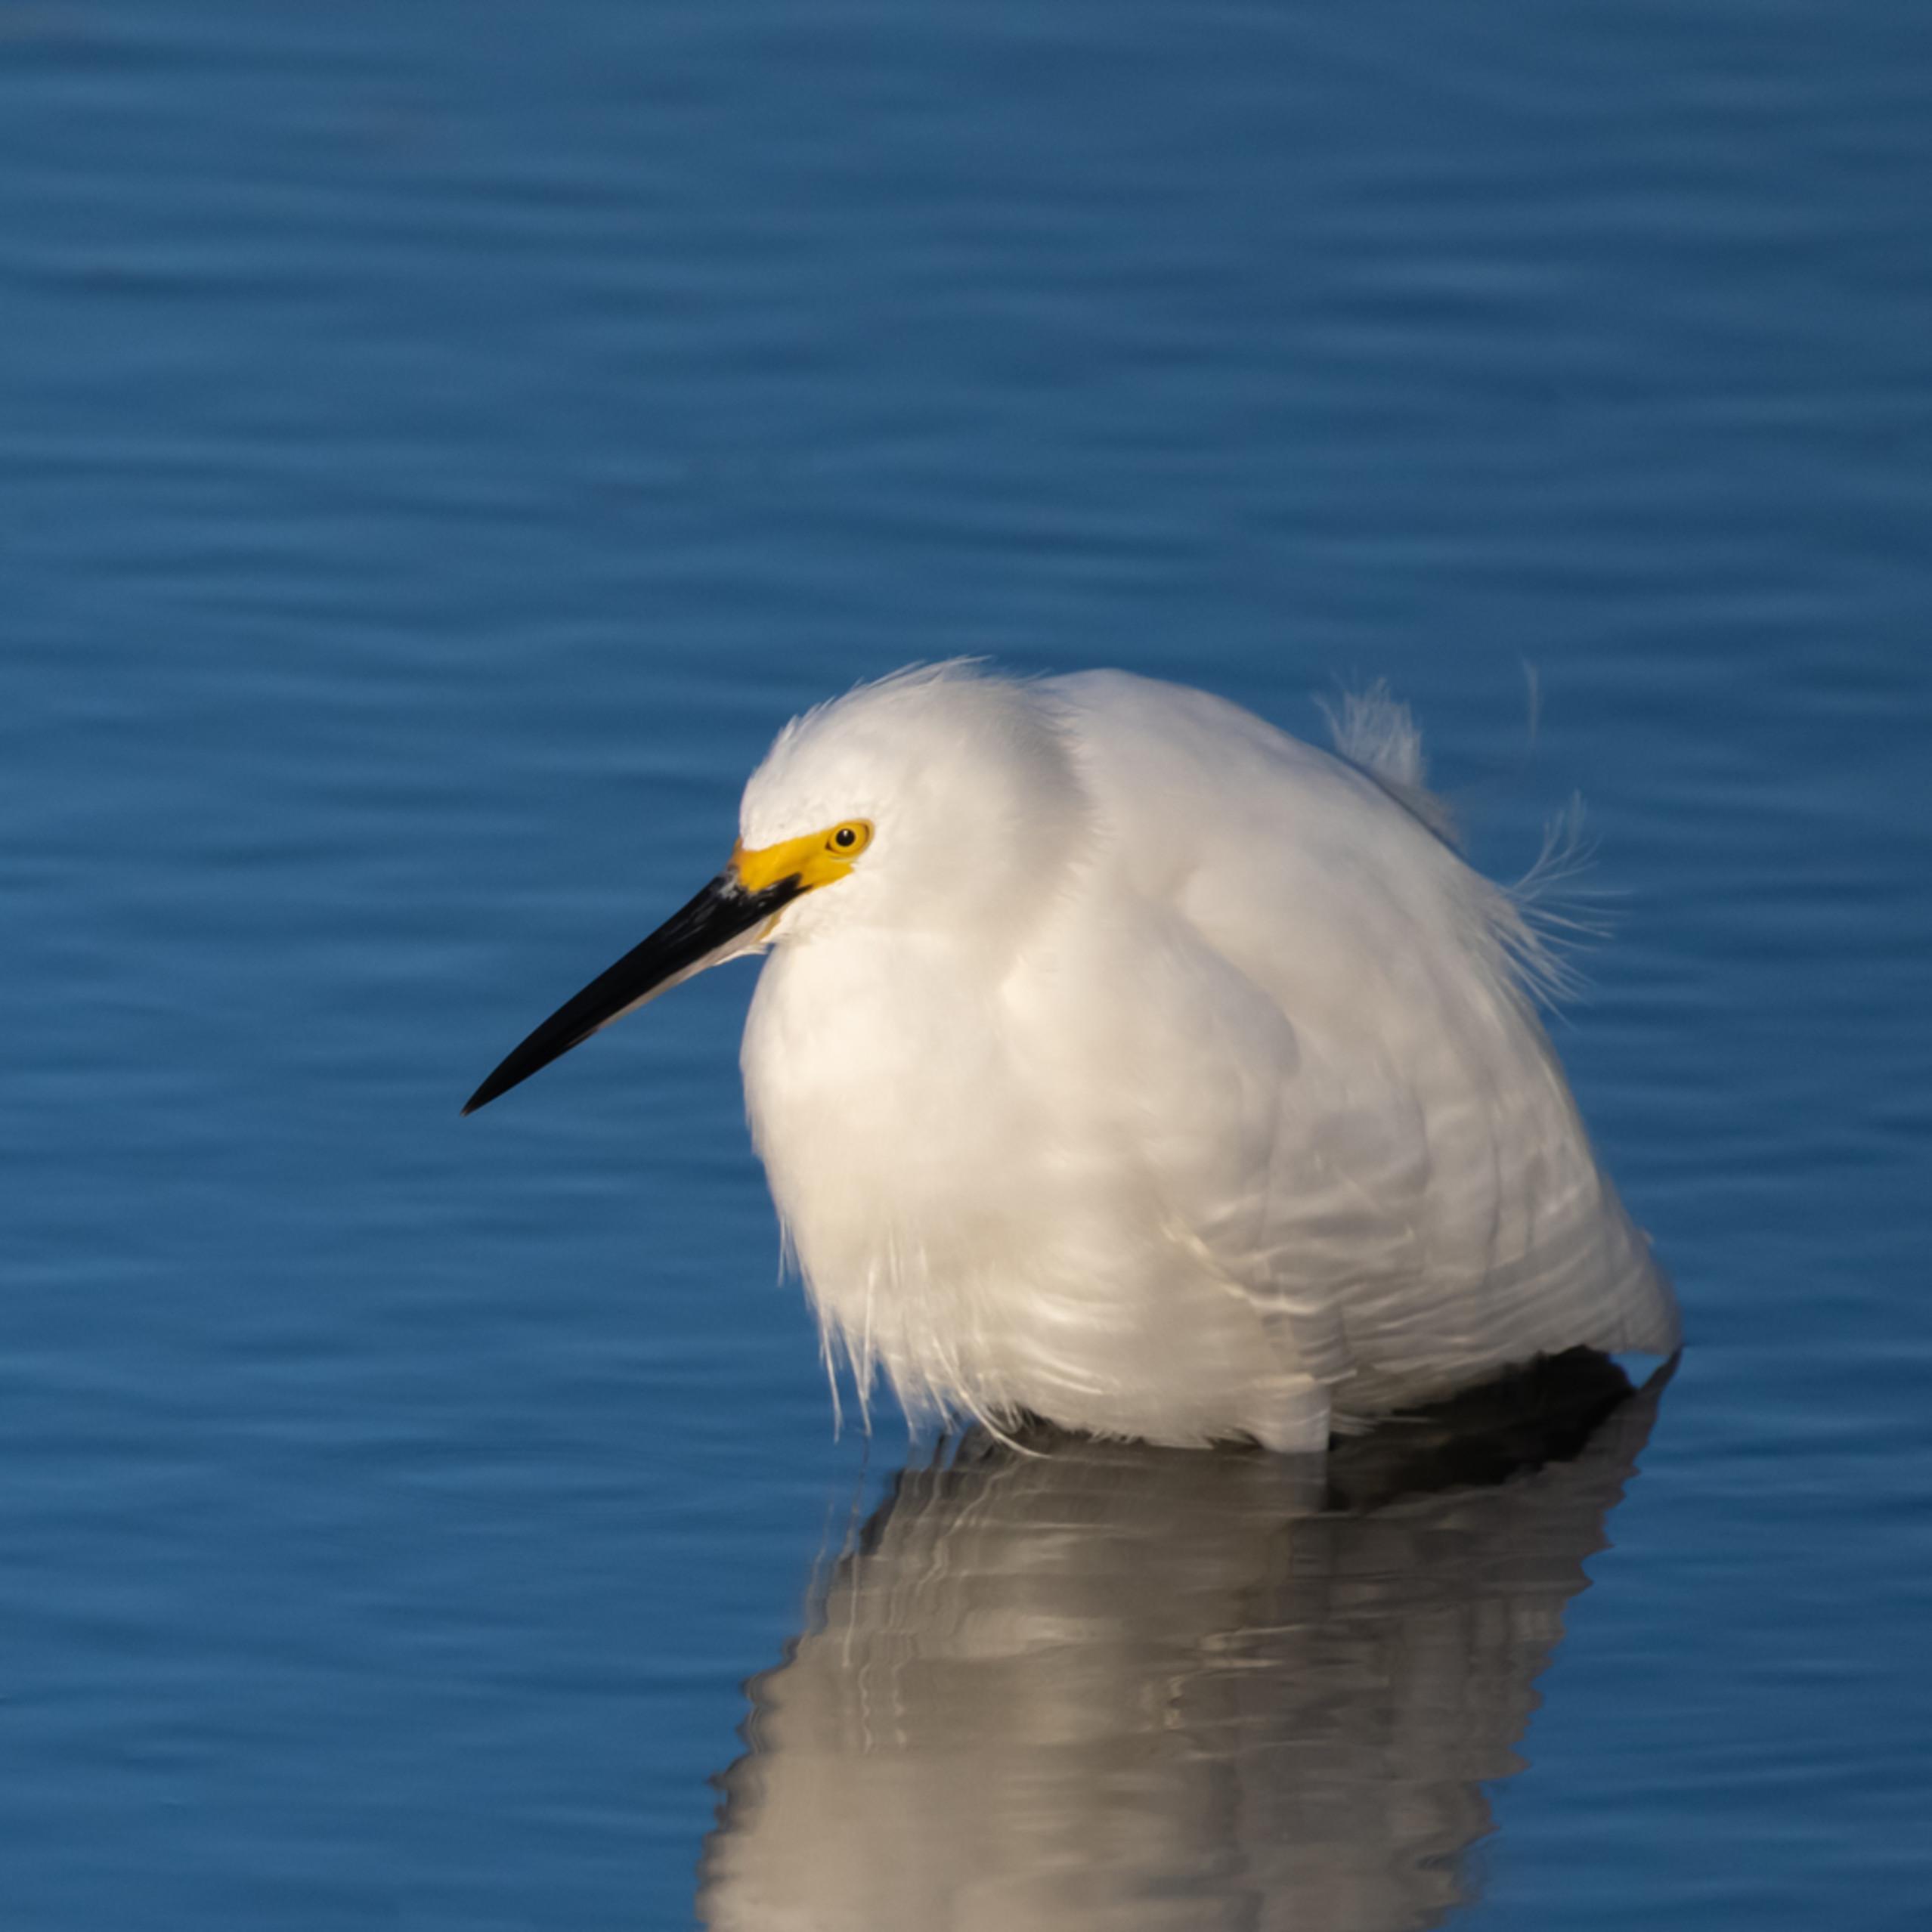 Egret portraits babe snowy egret asfprint yf8r91